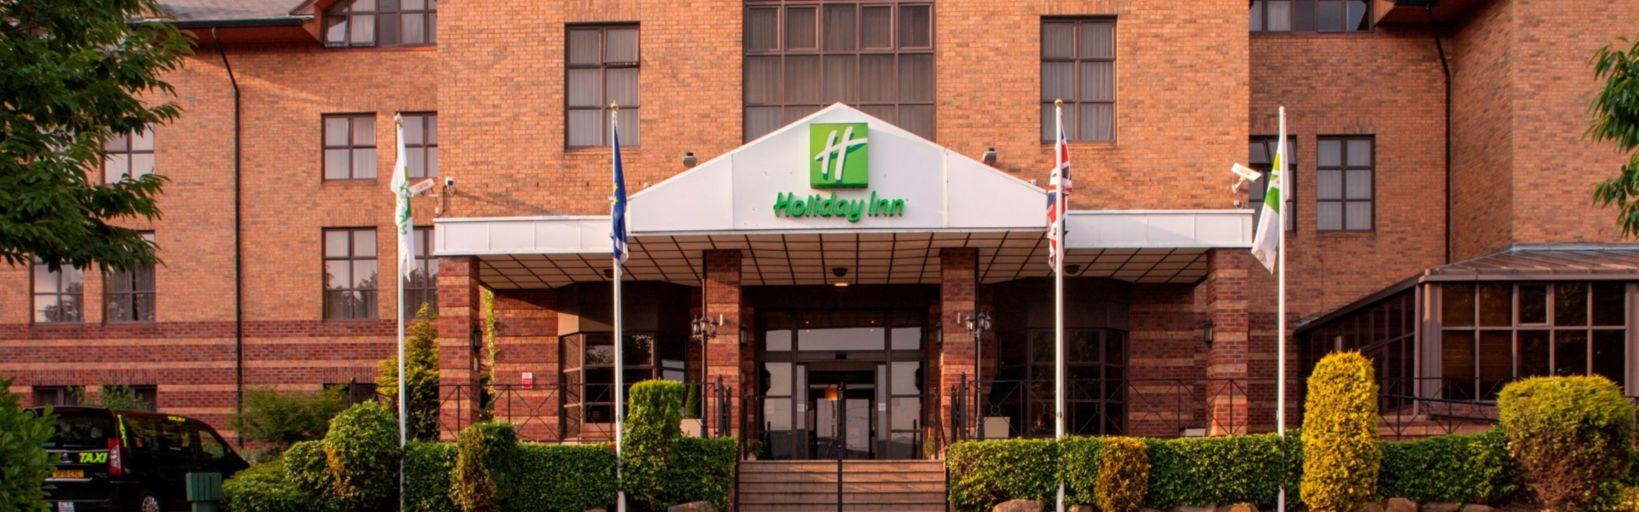 Holiday Inn Hotel Rotherham-Sheffield M1, Jct. 33